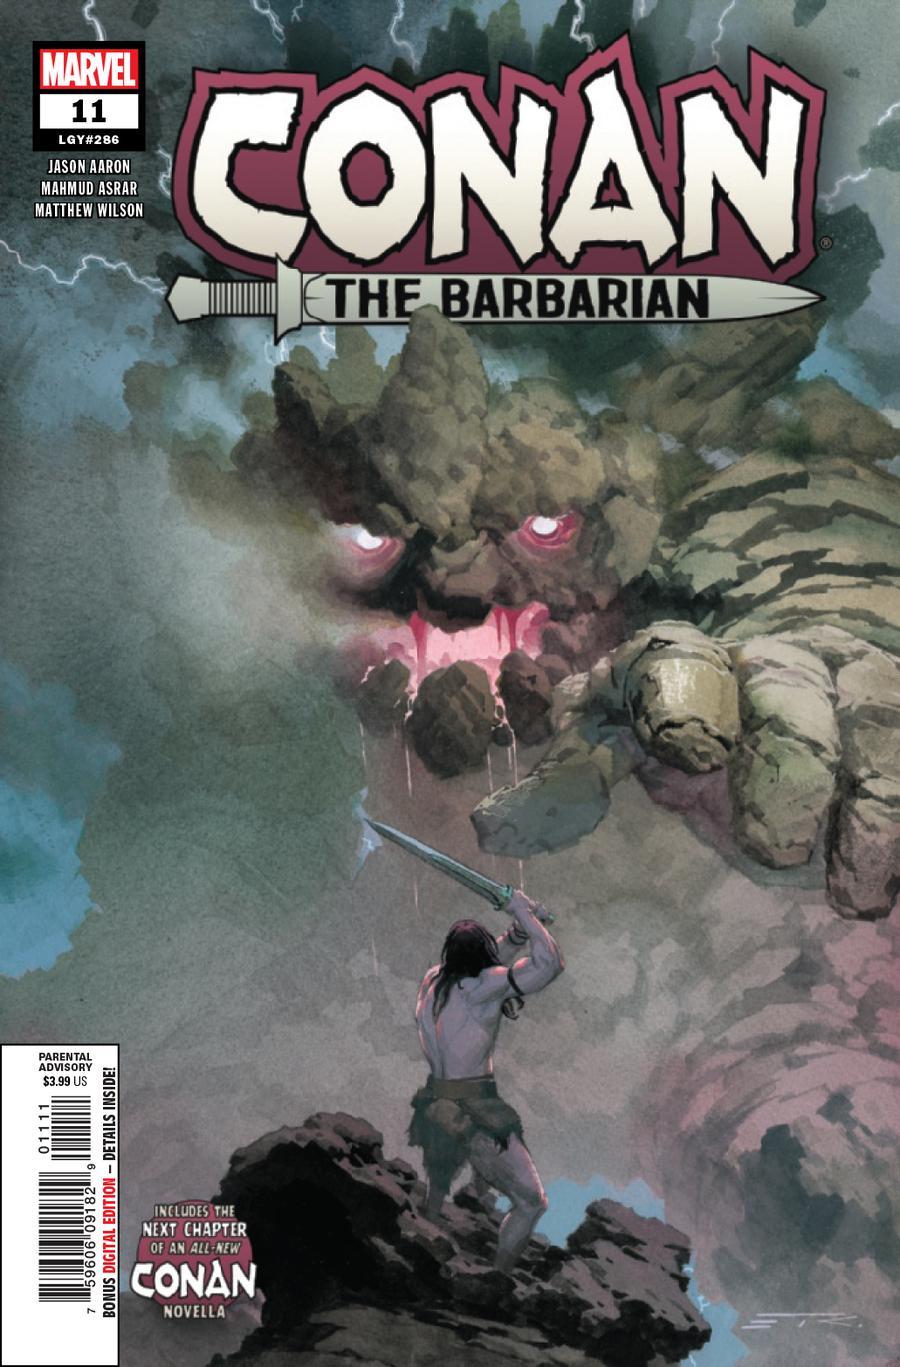 Conan The Barbarian Vol 4 #11 Cover A Regular Esad Ribic Cover